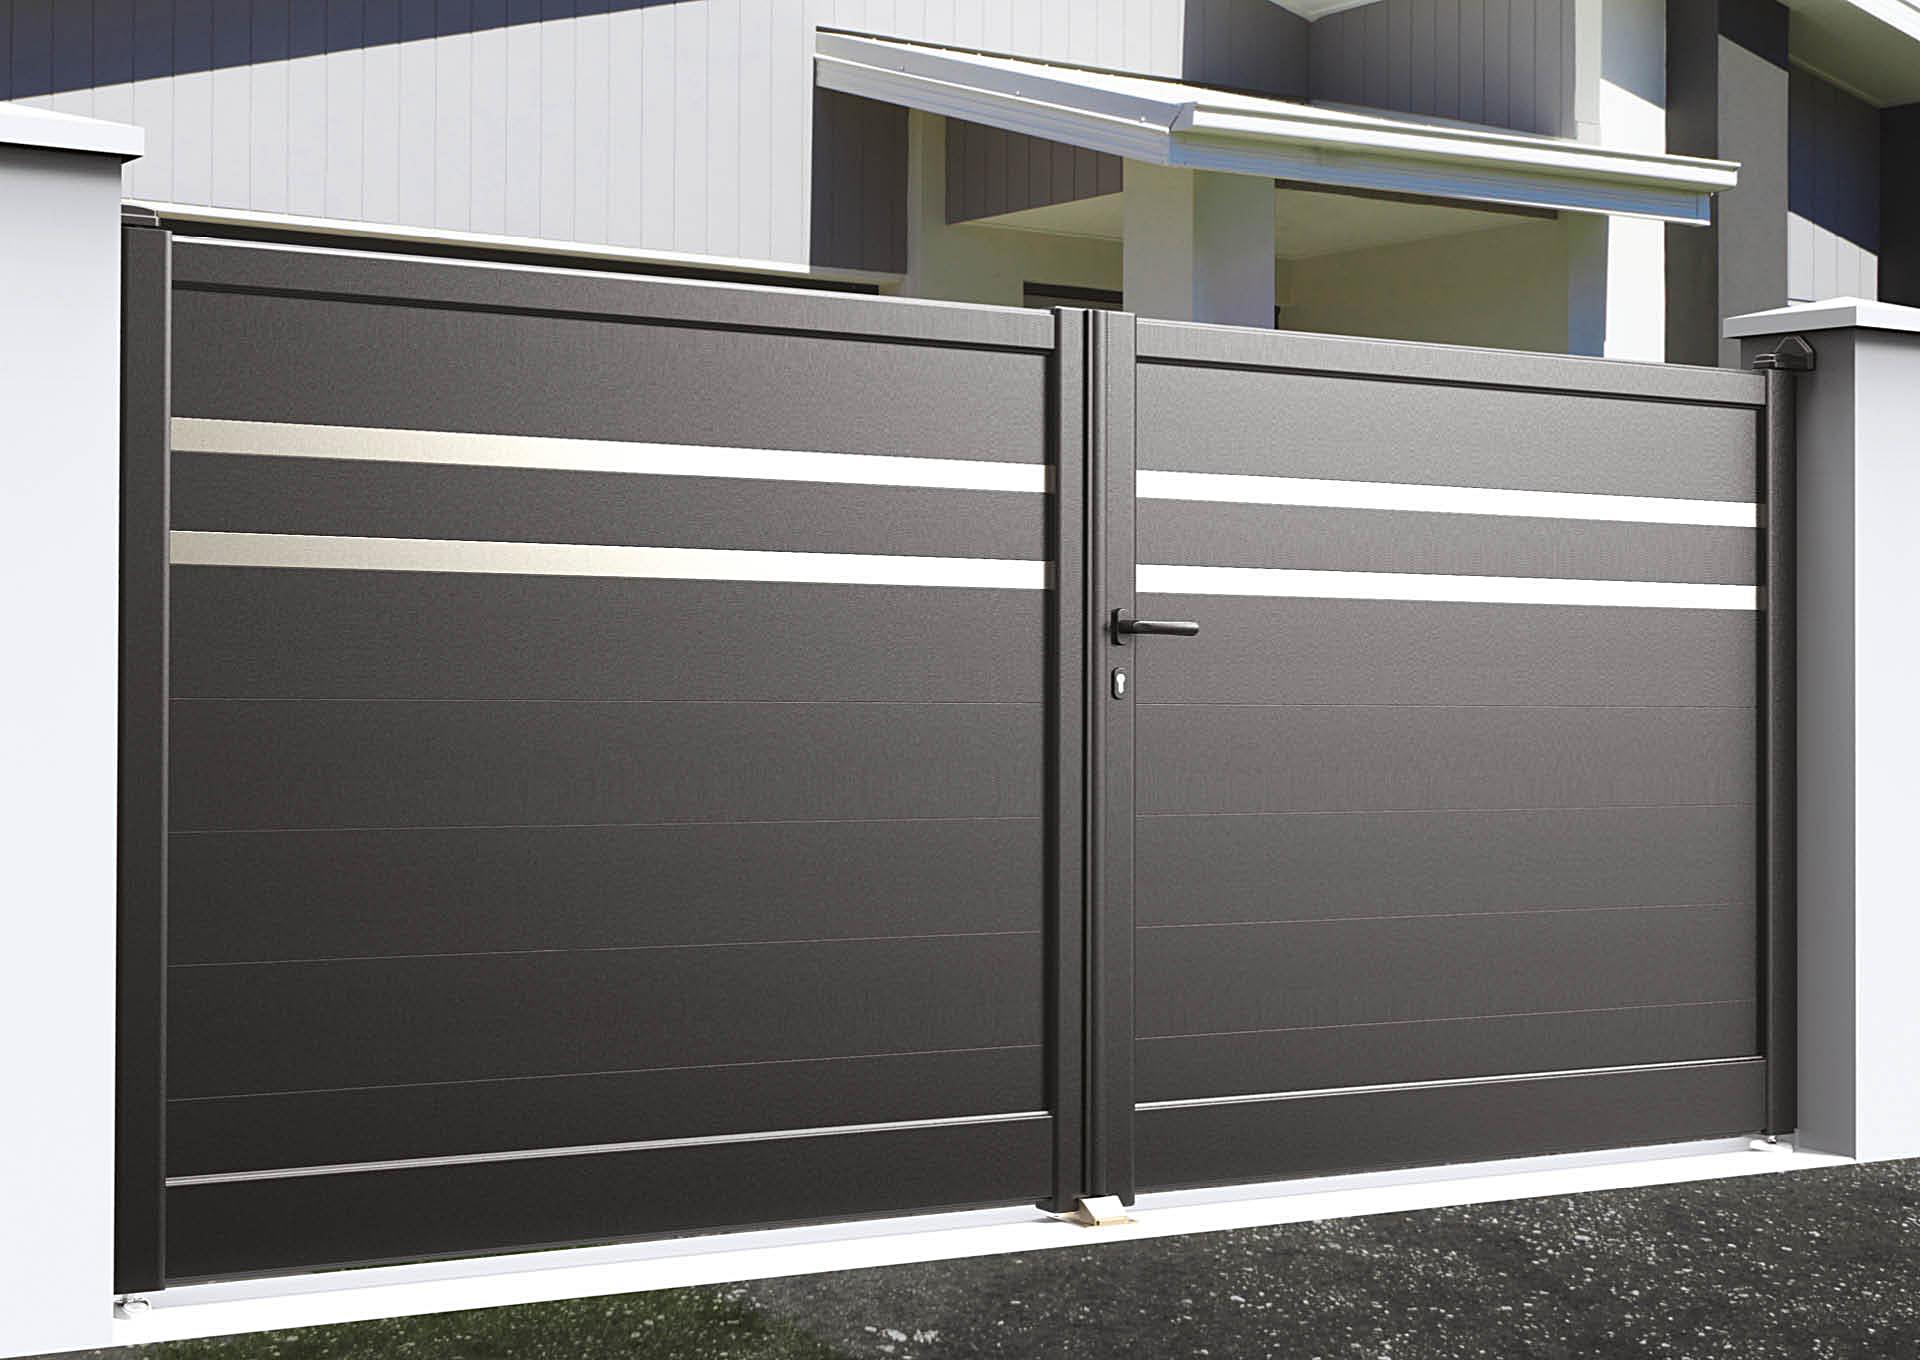 Portail battant en aluminium Lames horizontales 200 mm + 2 liserés inox 50 mm